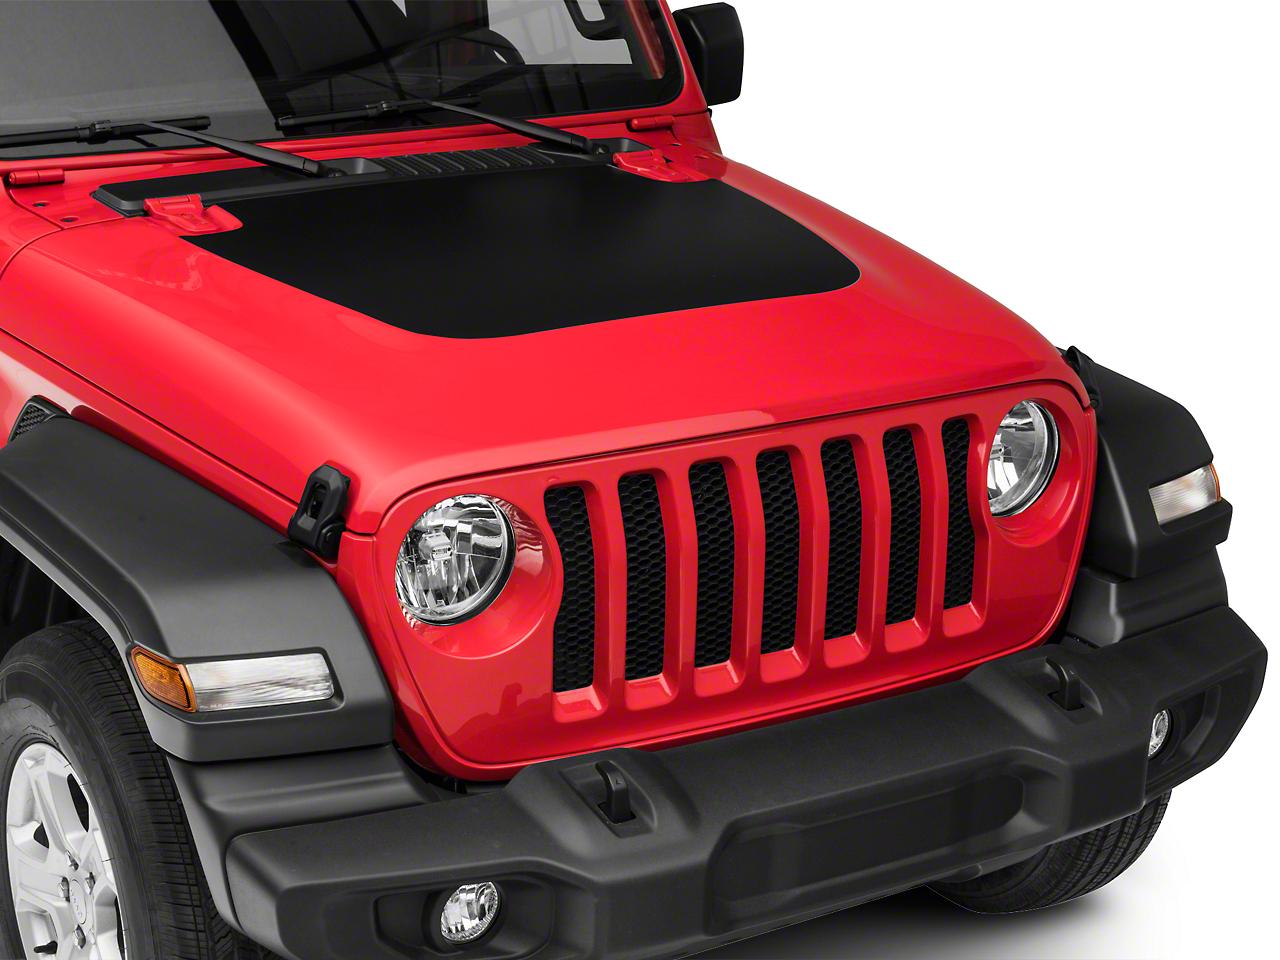 Hood Decal - Matte Black (2018 Jeep Wrangler JL)